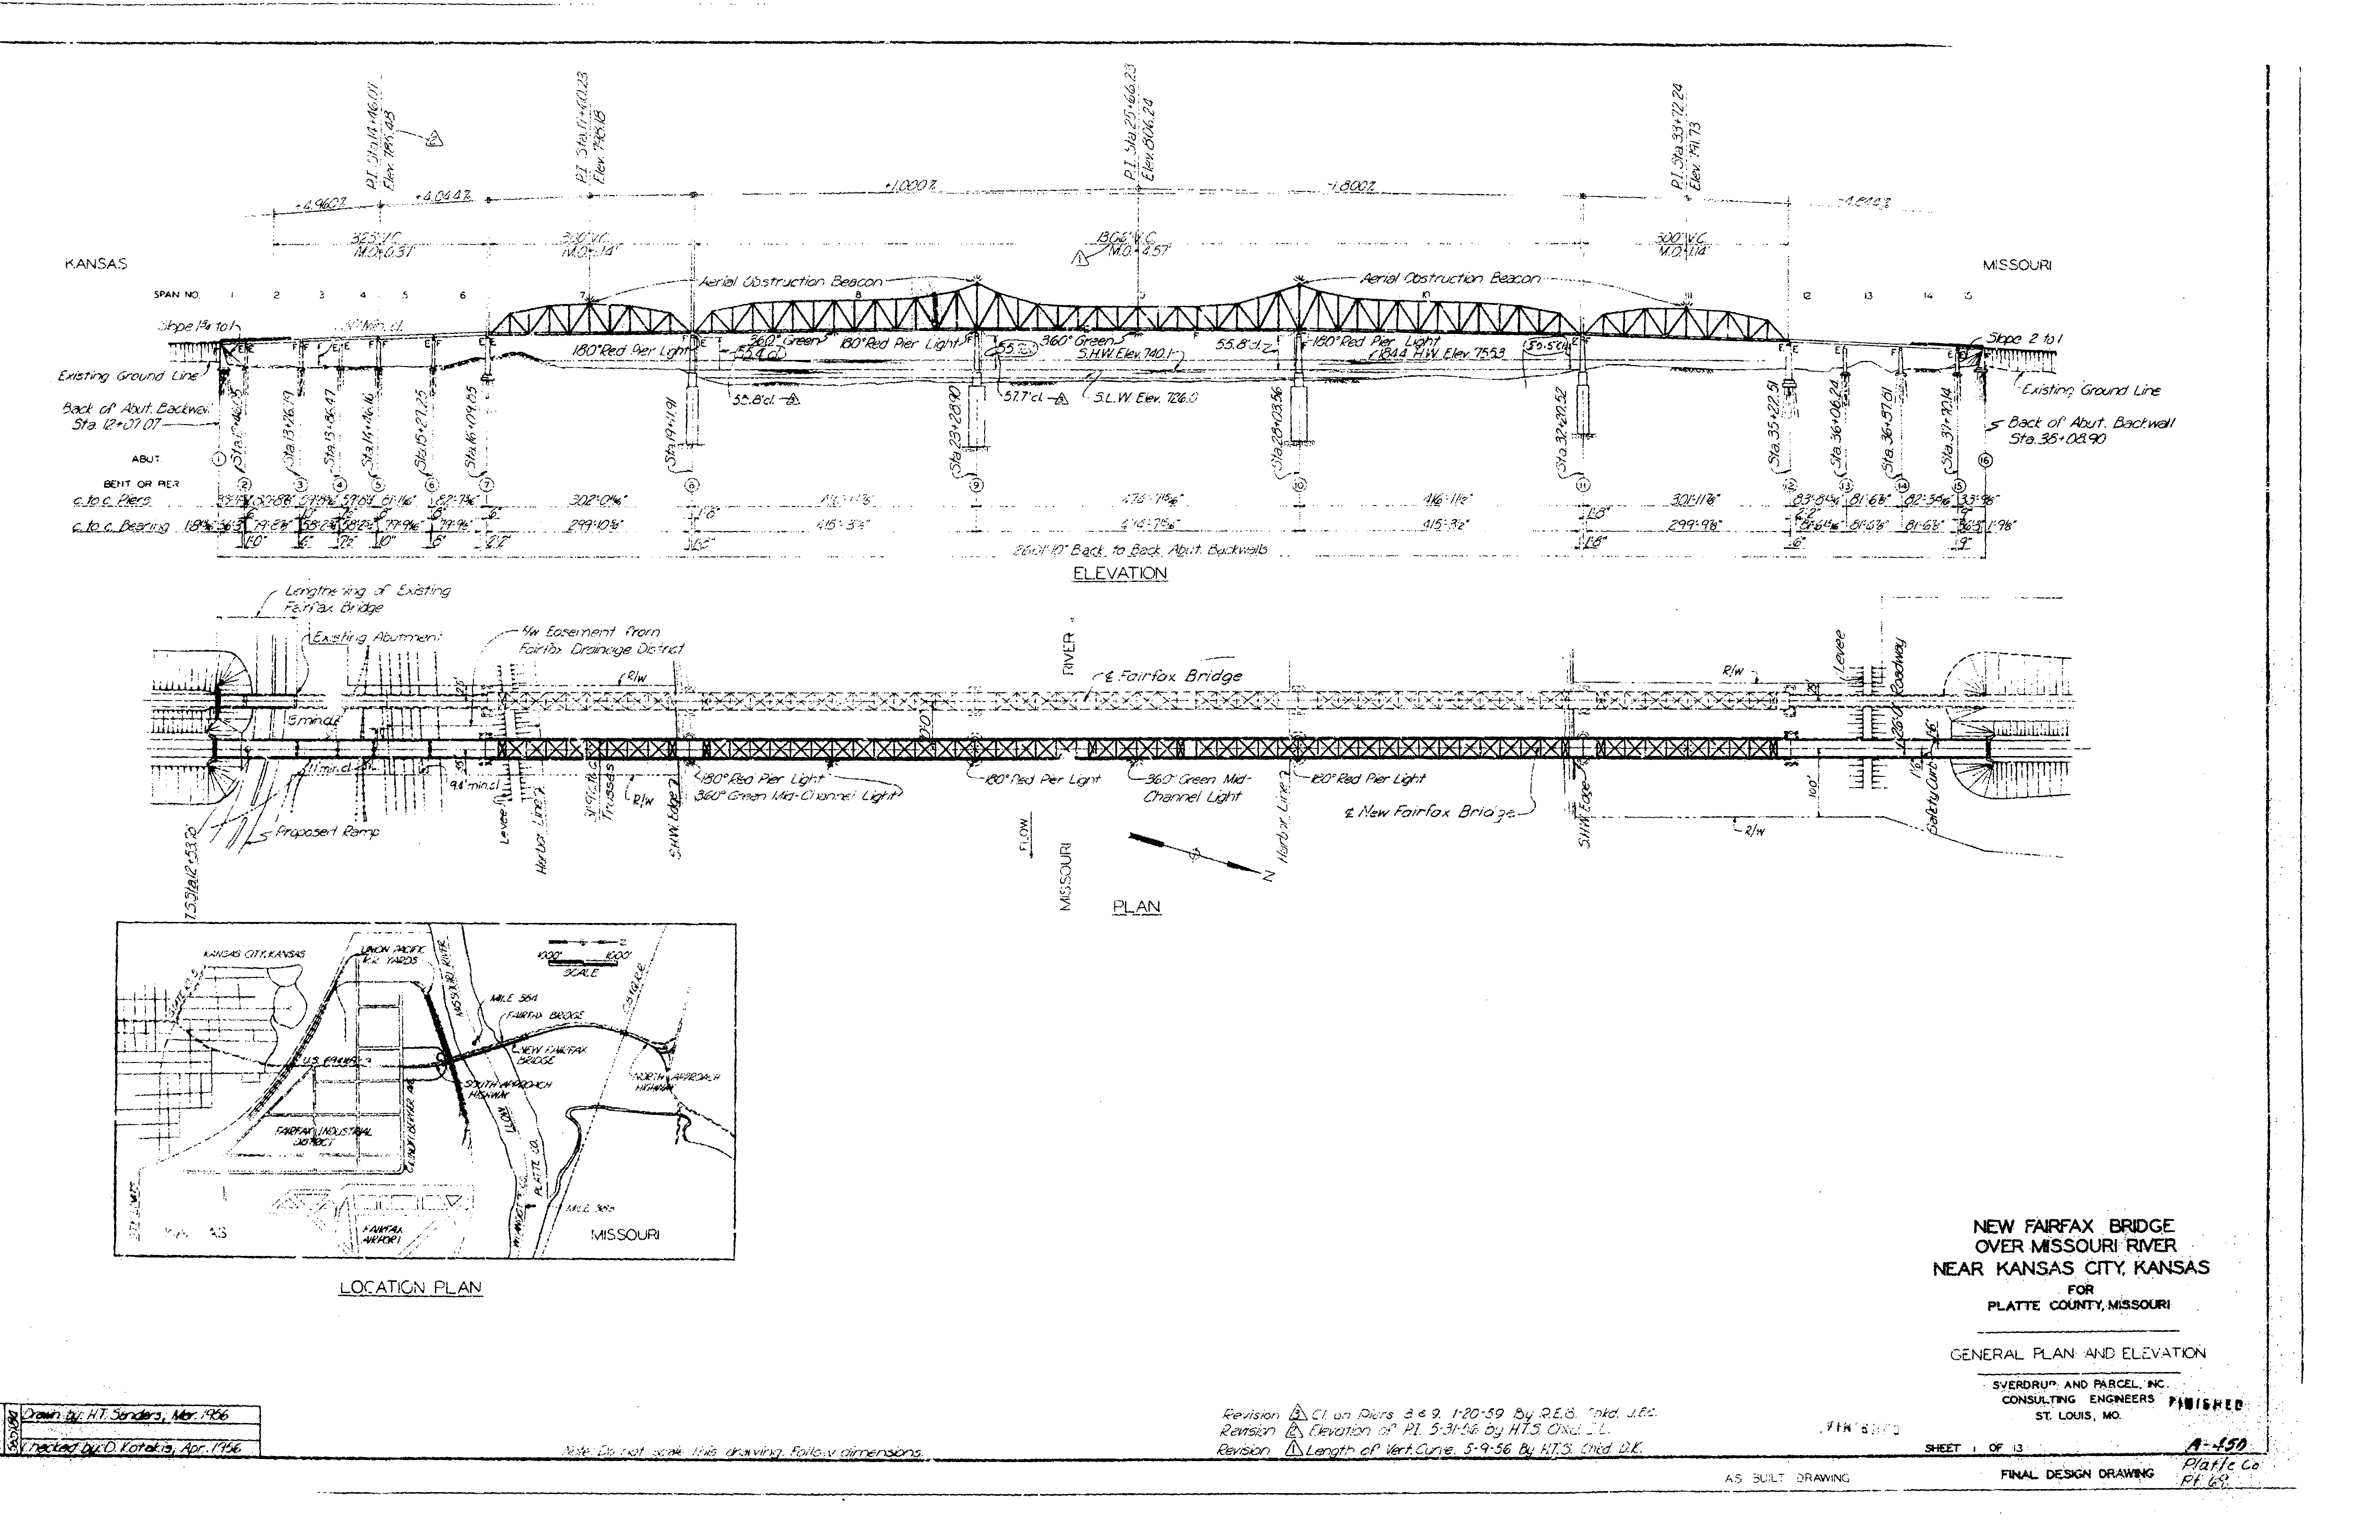 Platte Purchase Bridge (New Fairfax Bridge) - HistoricBridges.org